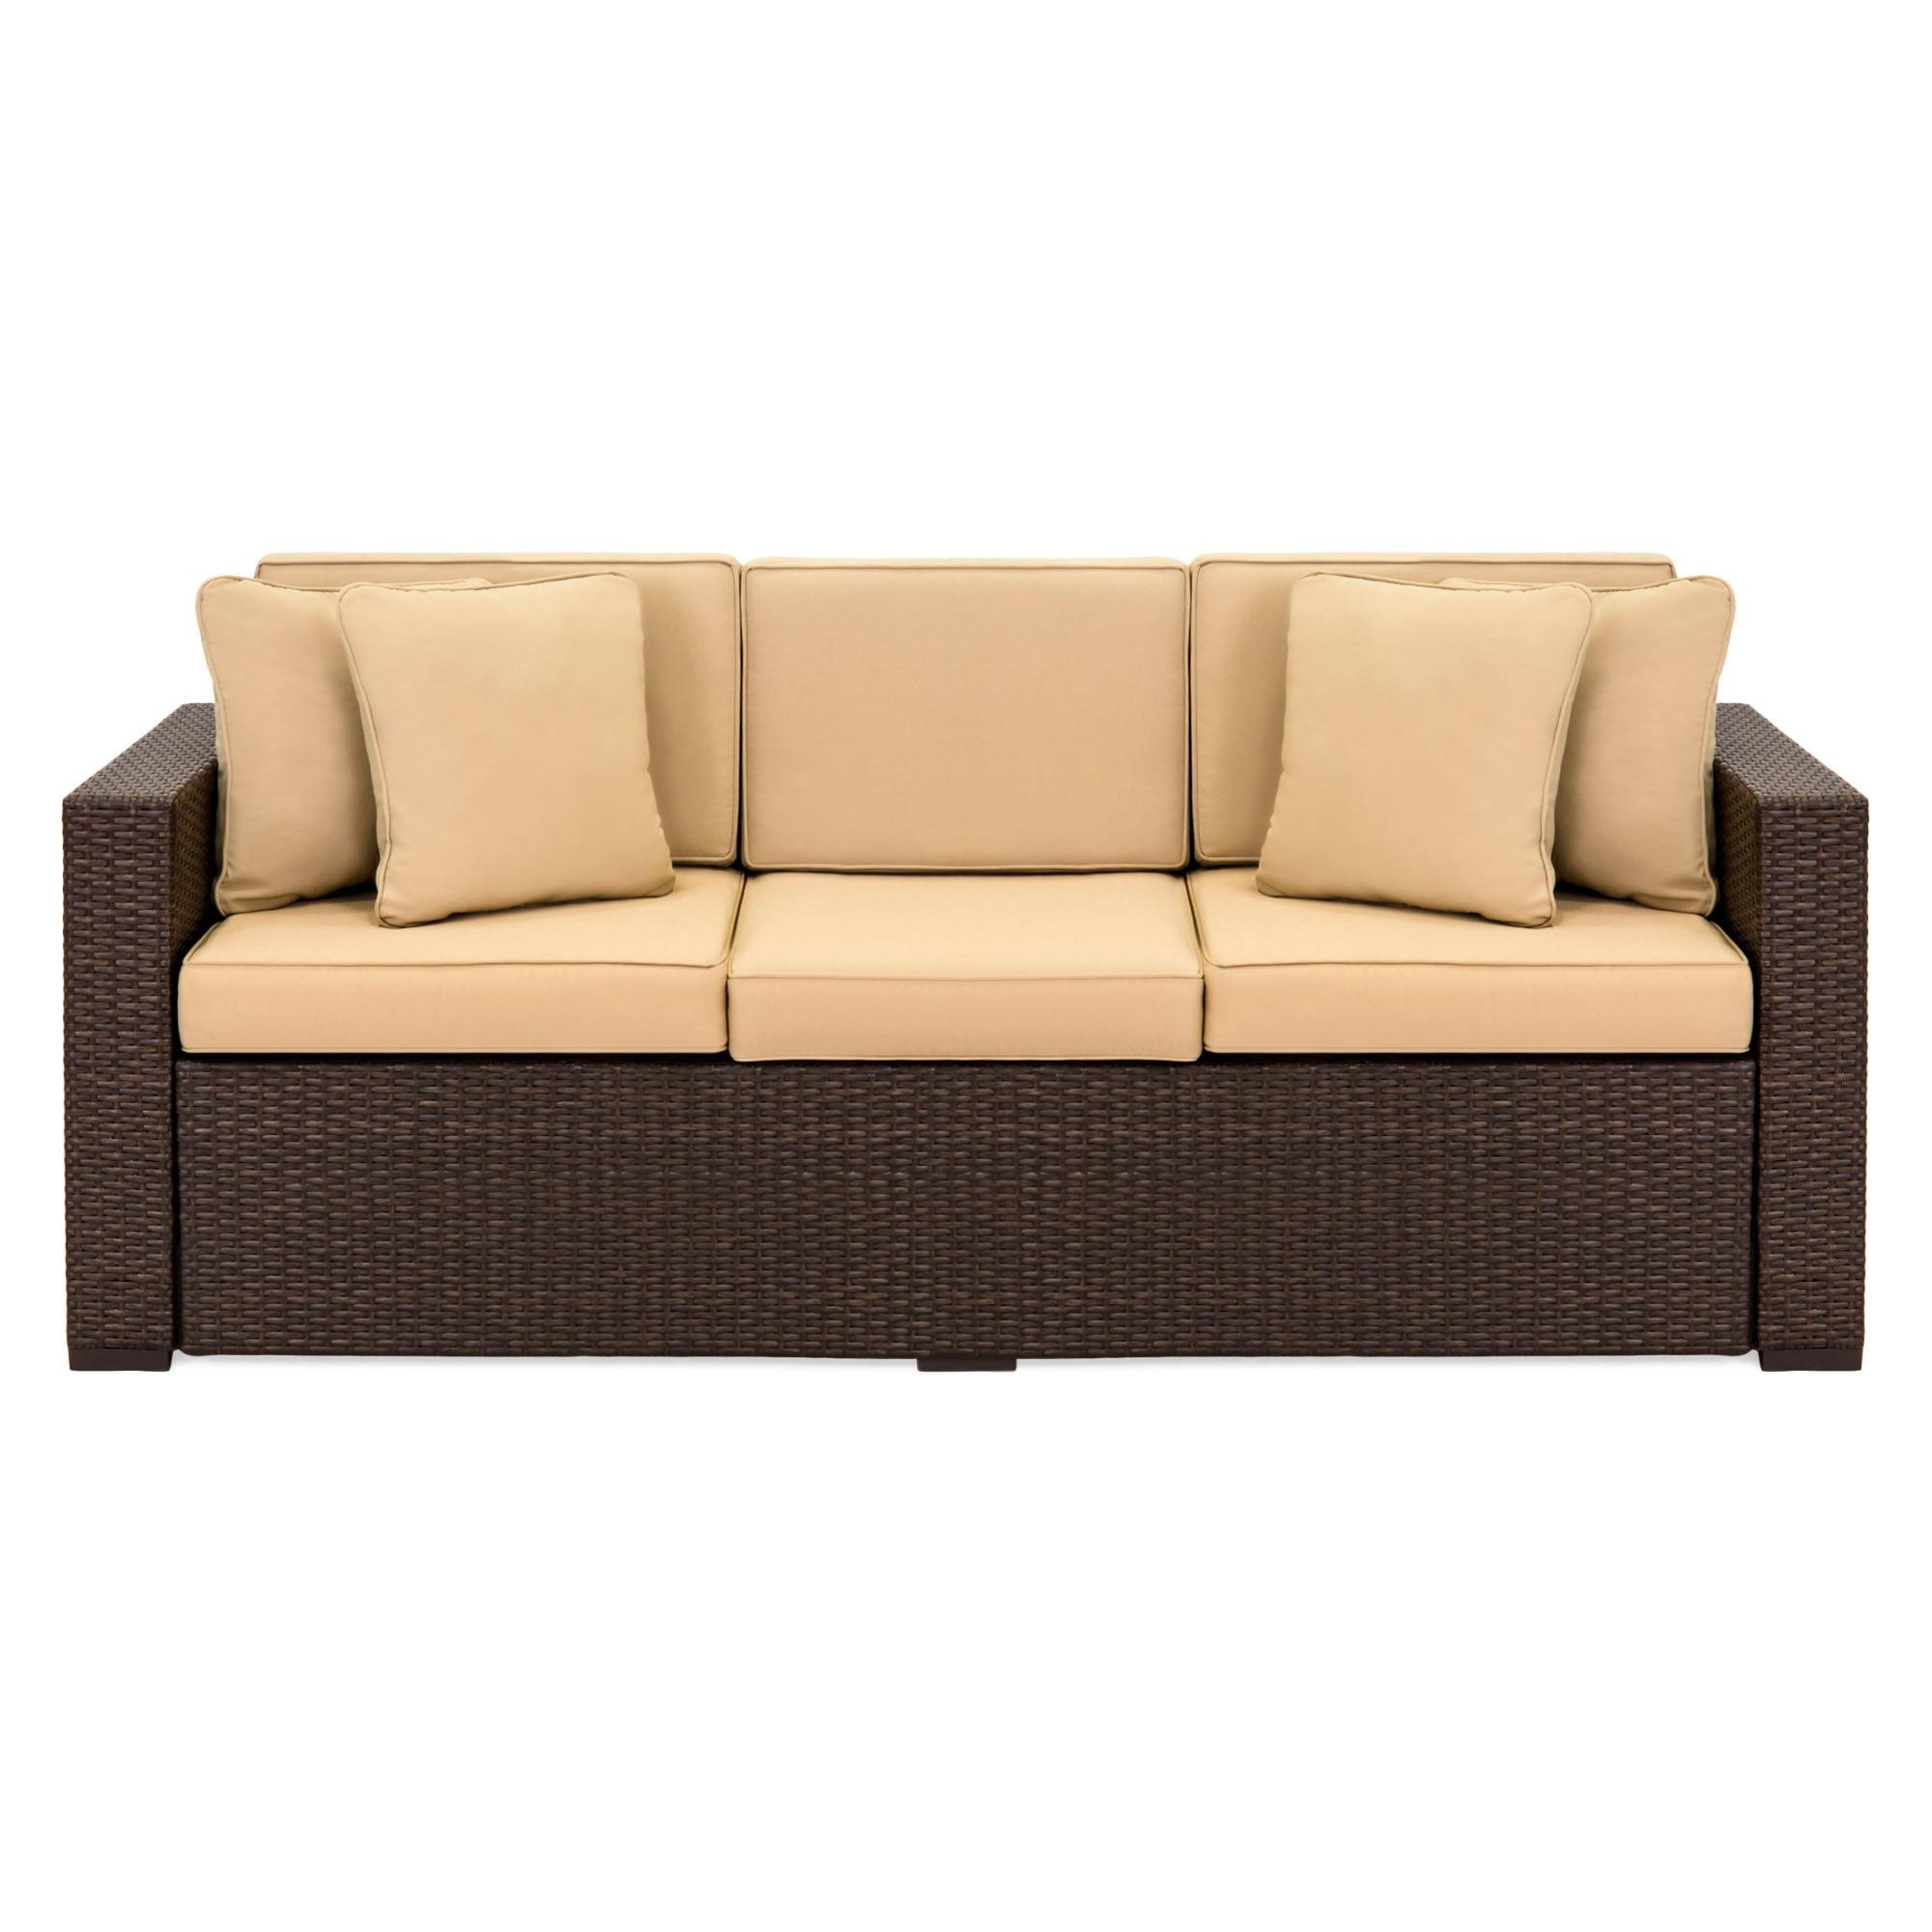 Seat Outdoor Wicker Patio Sofa